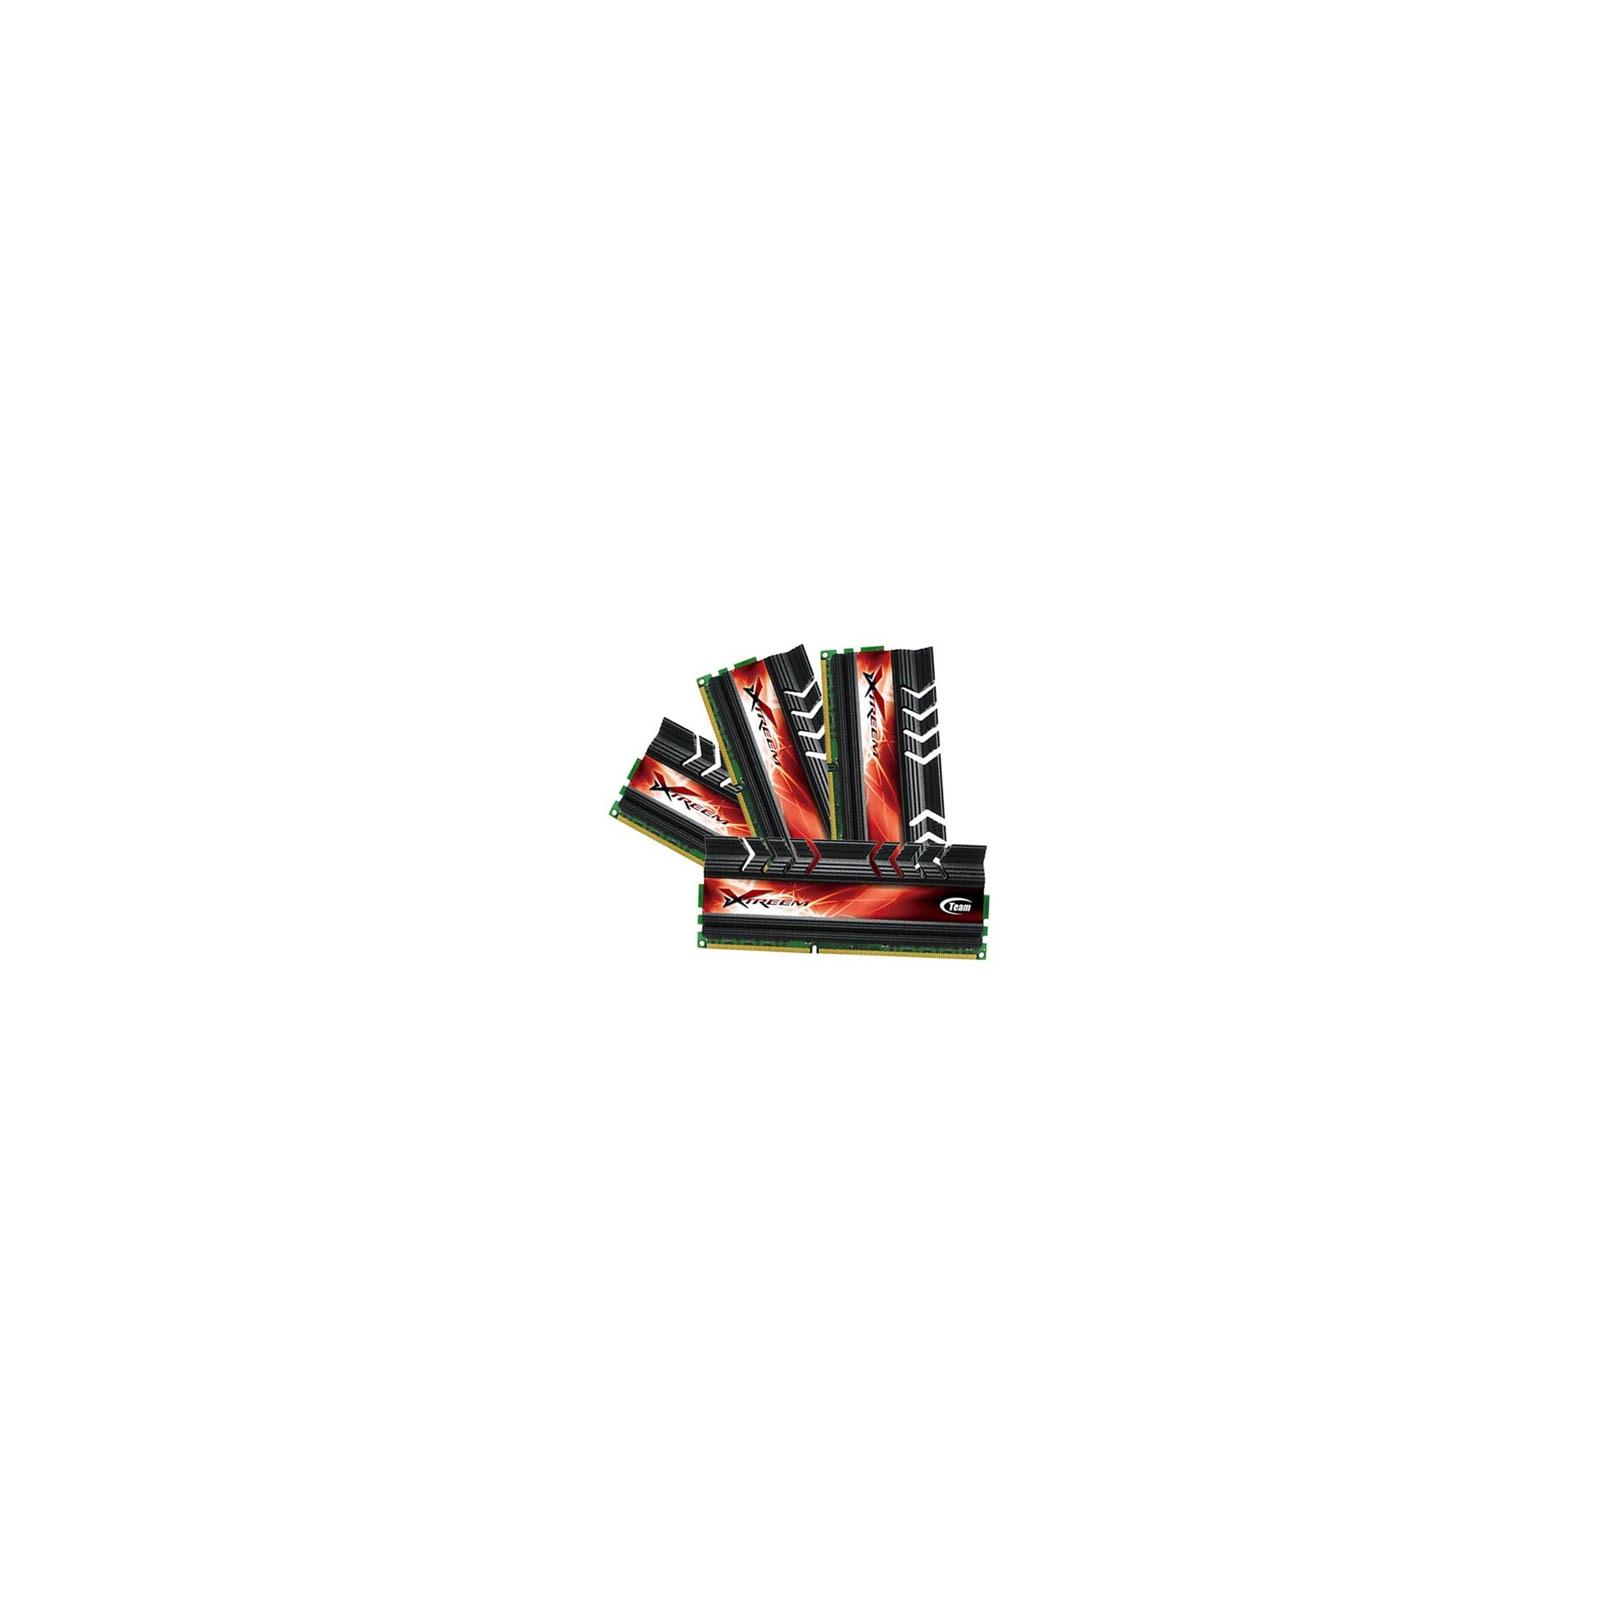 Модуль памяти для компьютера DDR3 32GB (4x8GB) 2133 MHz Team (TXD332G2133HC11QC-L)